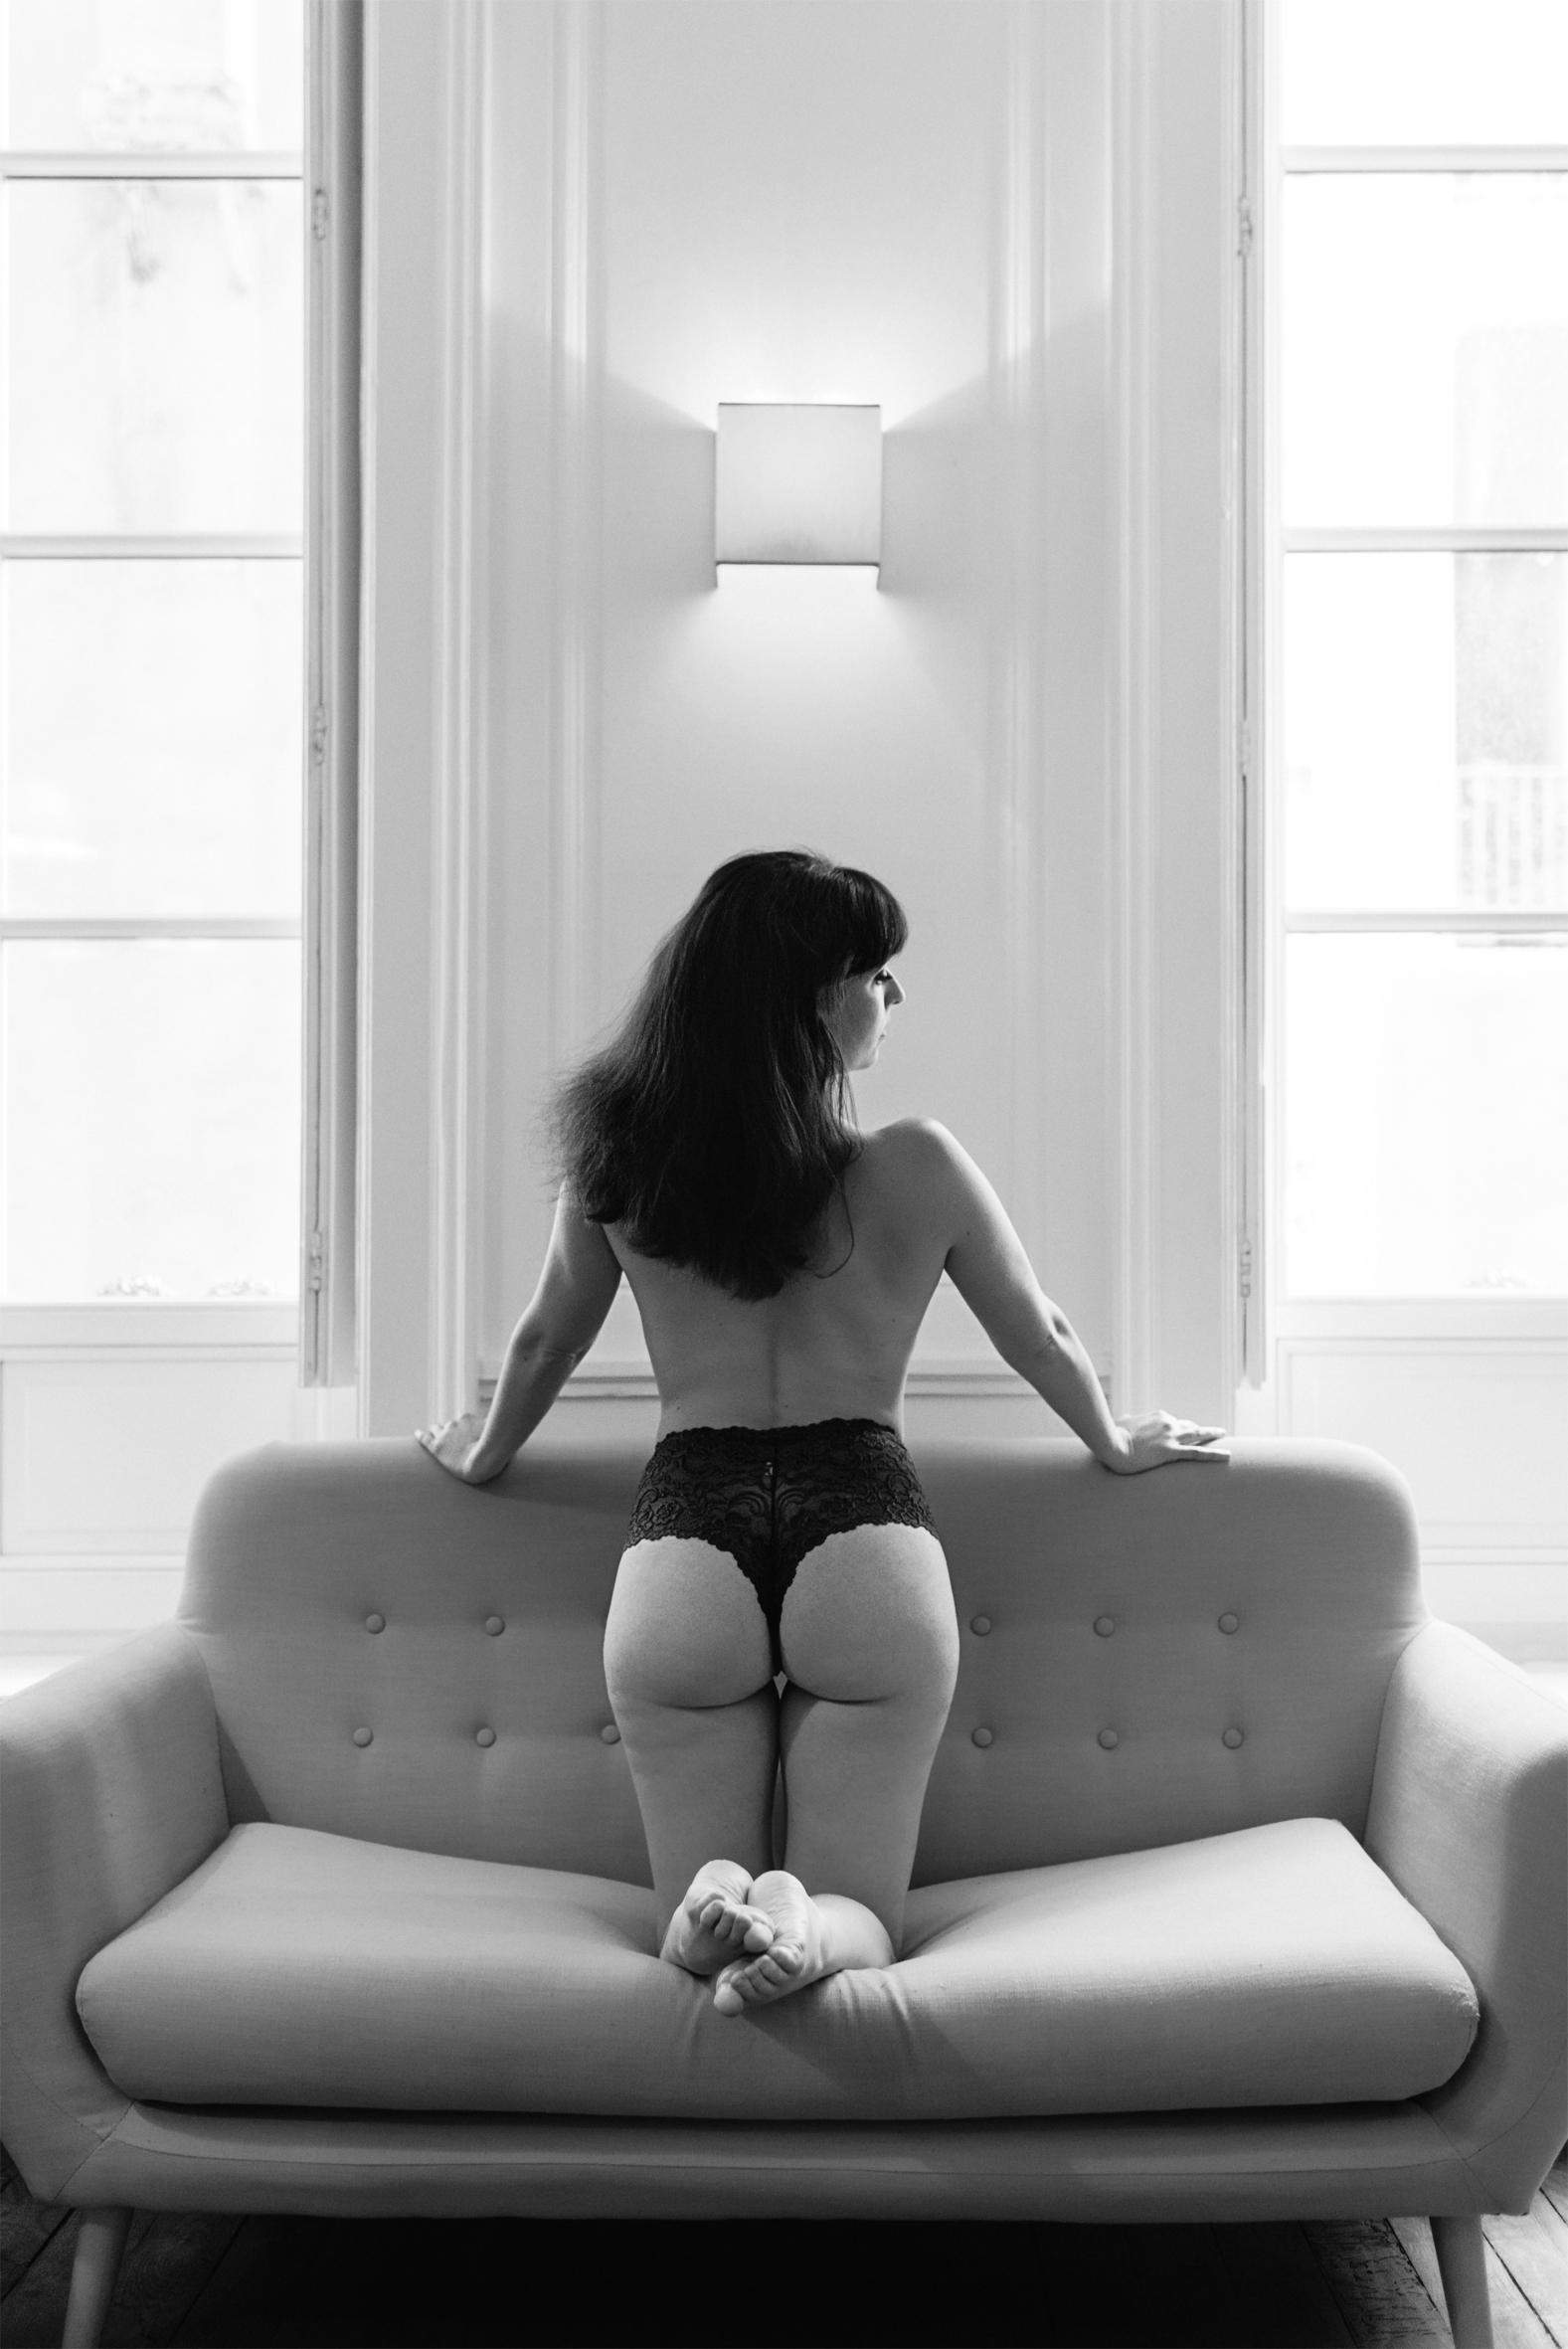 canada-boudoir photographer- toronto-scandaleuse photography-boudoir photography-france-toronto blog-blogger-woman-sexy-erotism-erotic-nude-